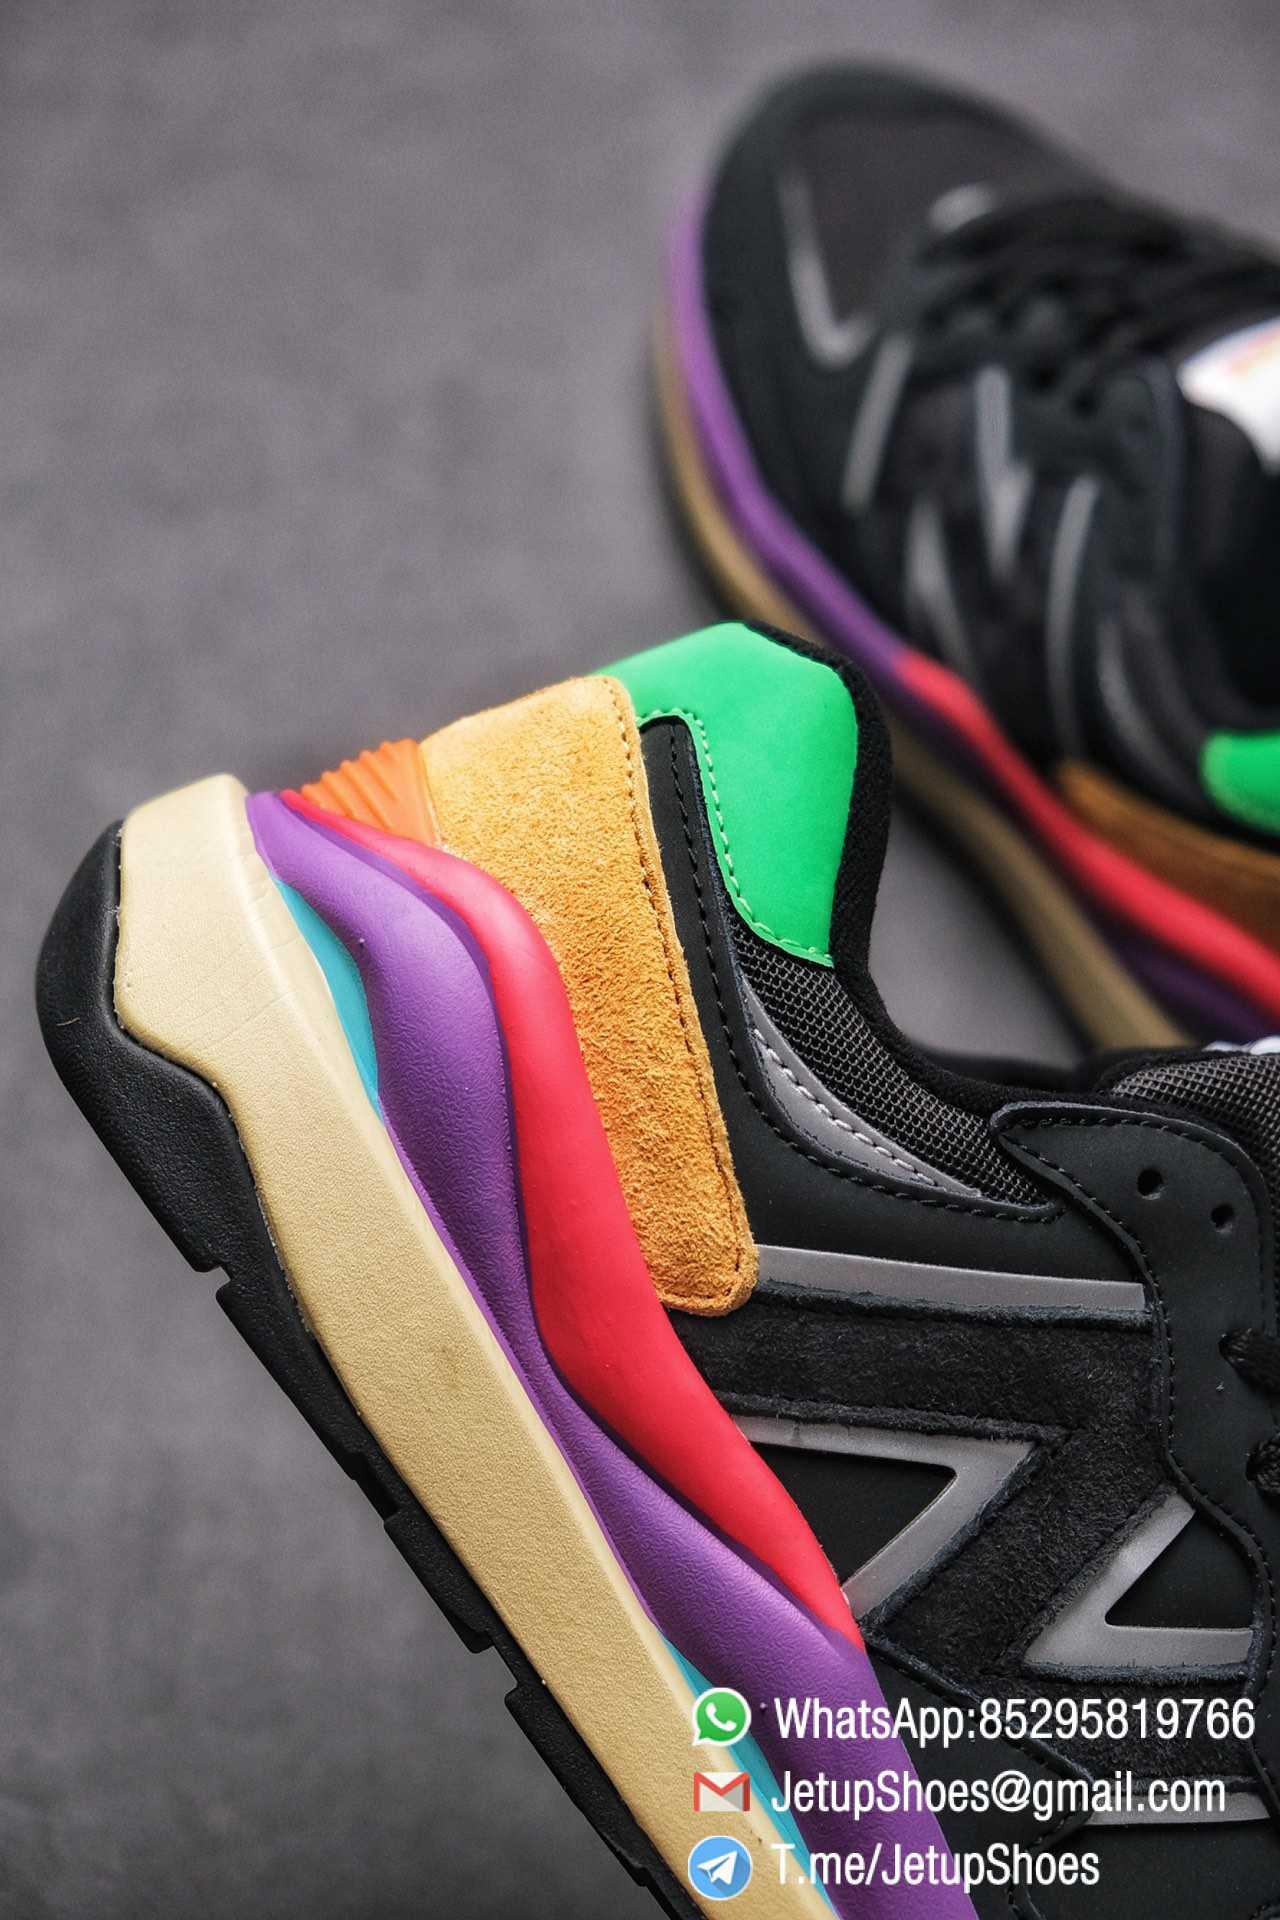 New Balance 5740 Black Multicolor Running Sneakers M5740LB Black Mesh Upper Oriange Suede Oversized N 07